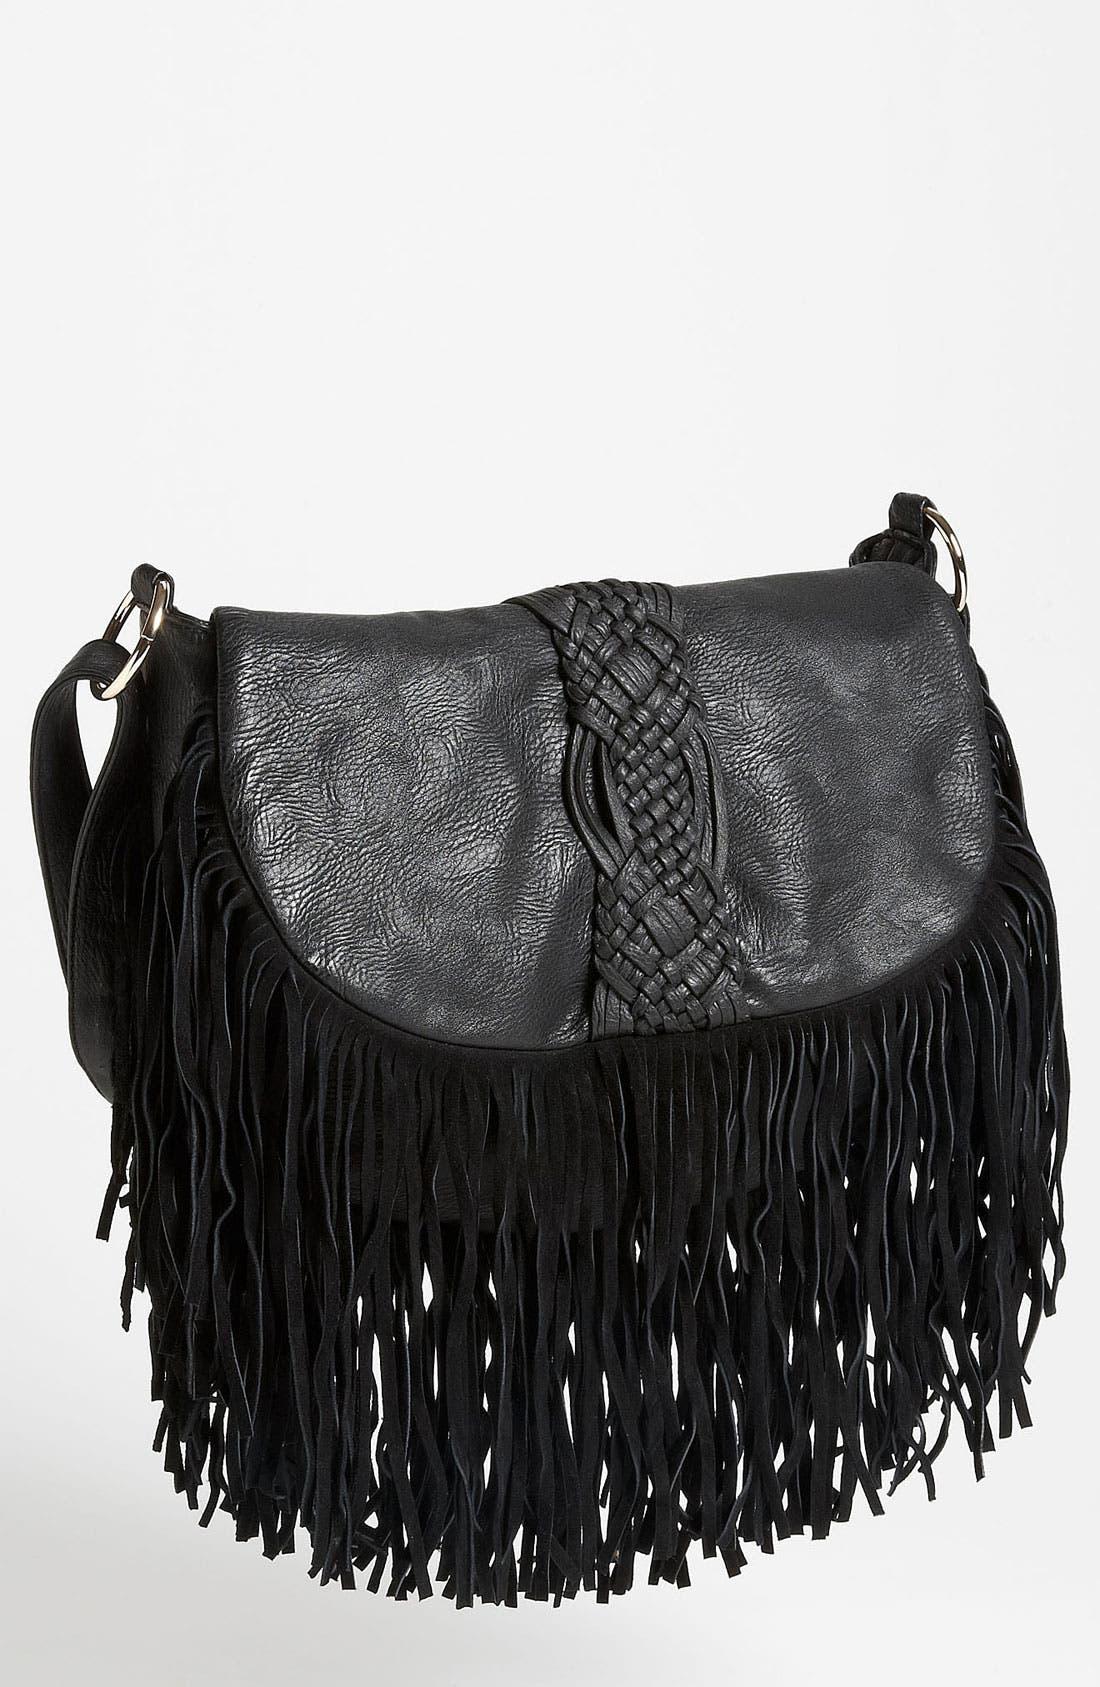 Main Image - Street Level Woven Fringe Crossbody Bag